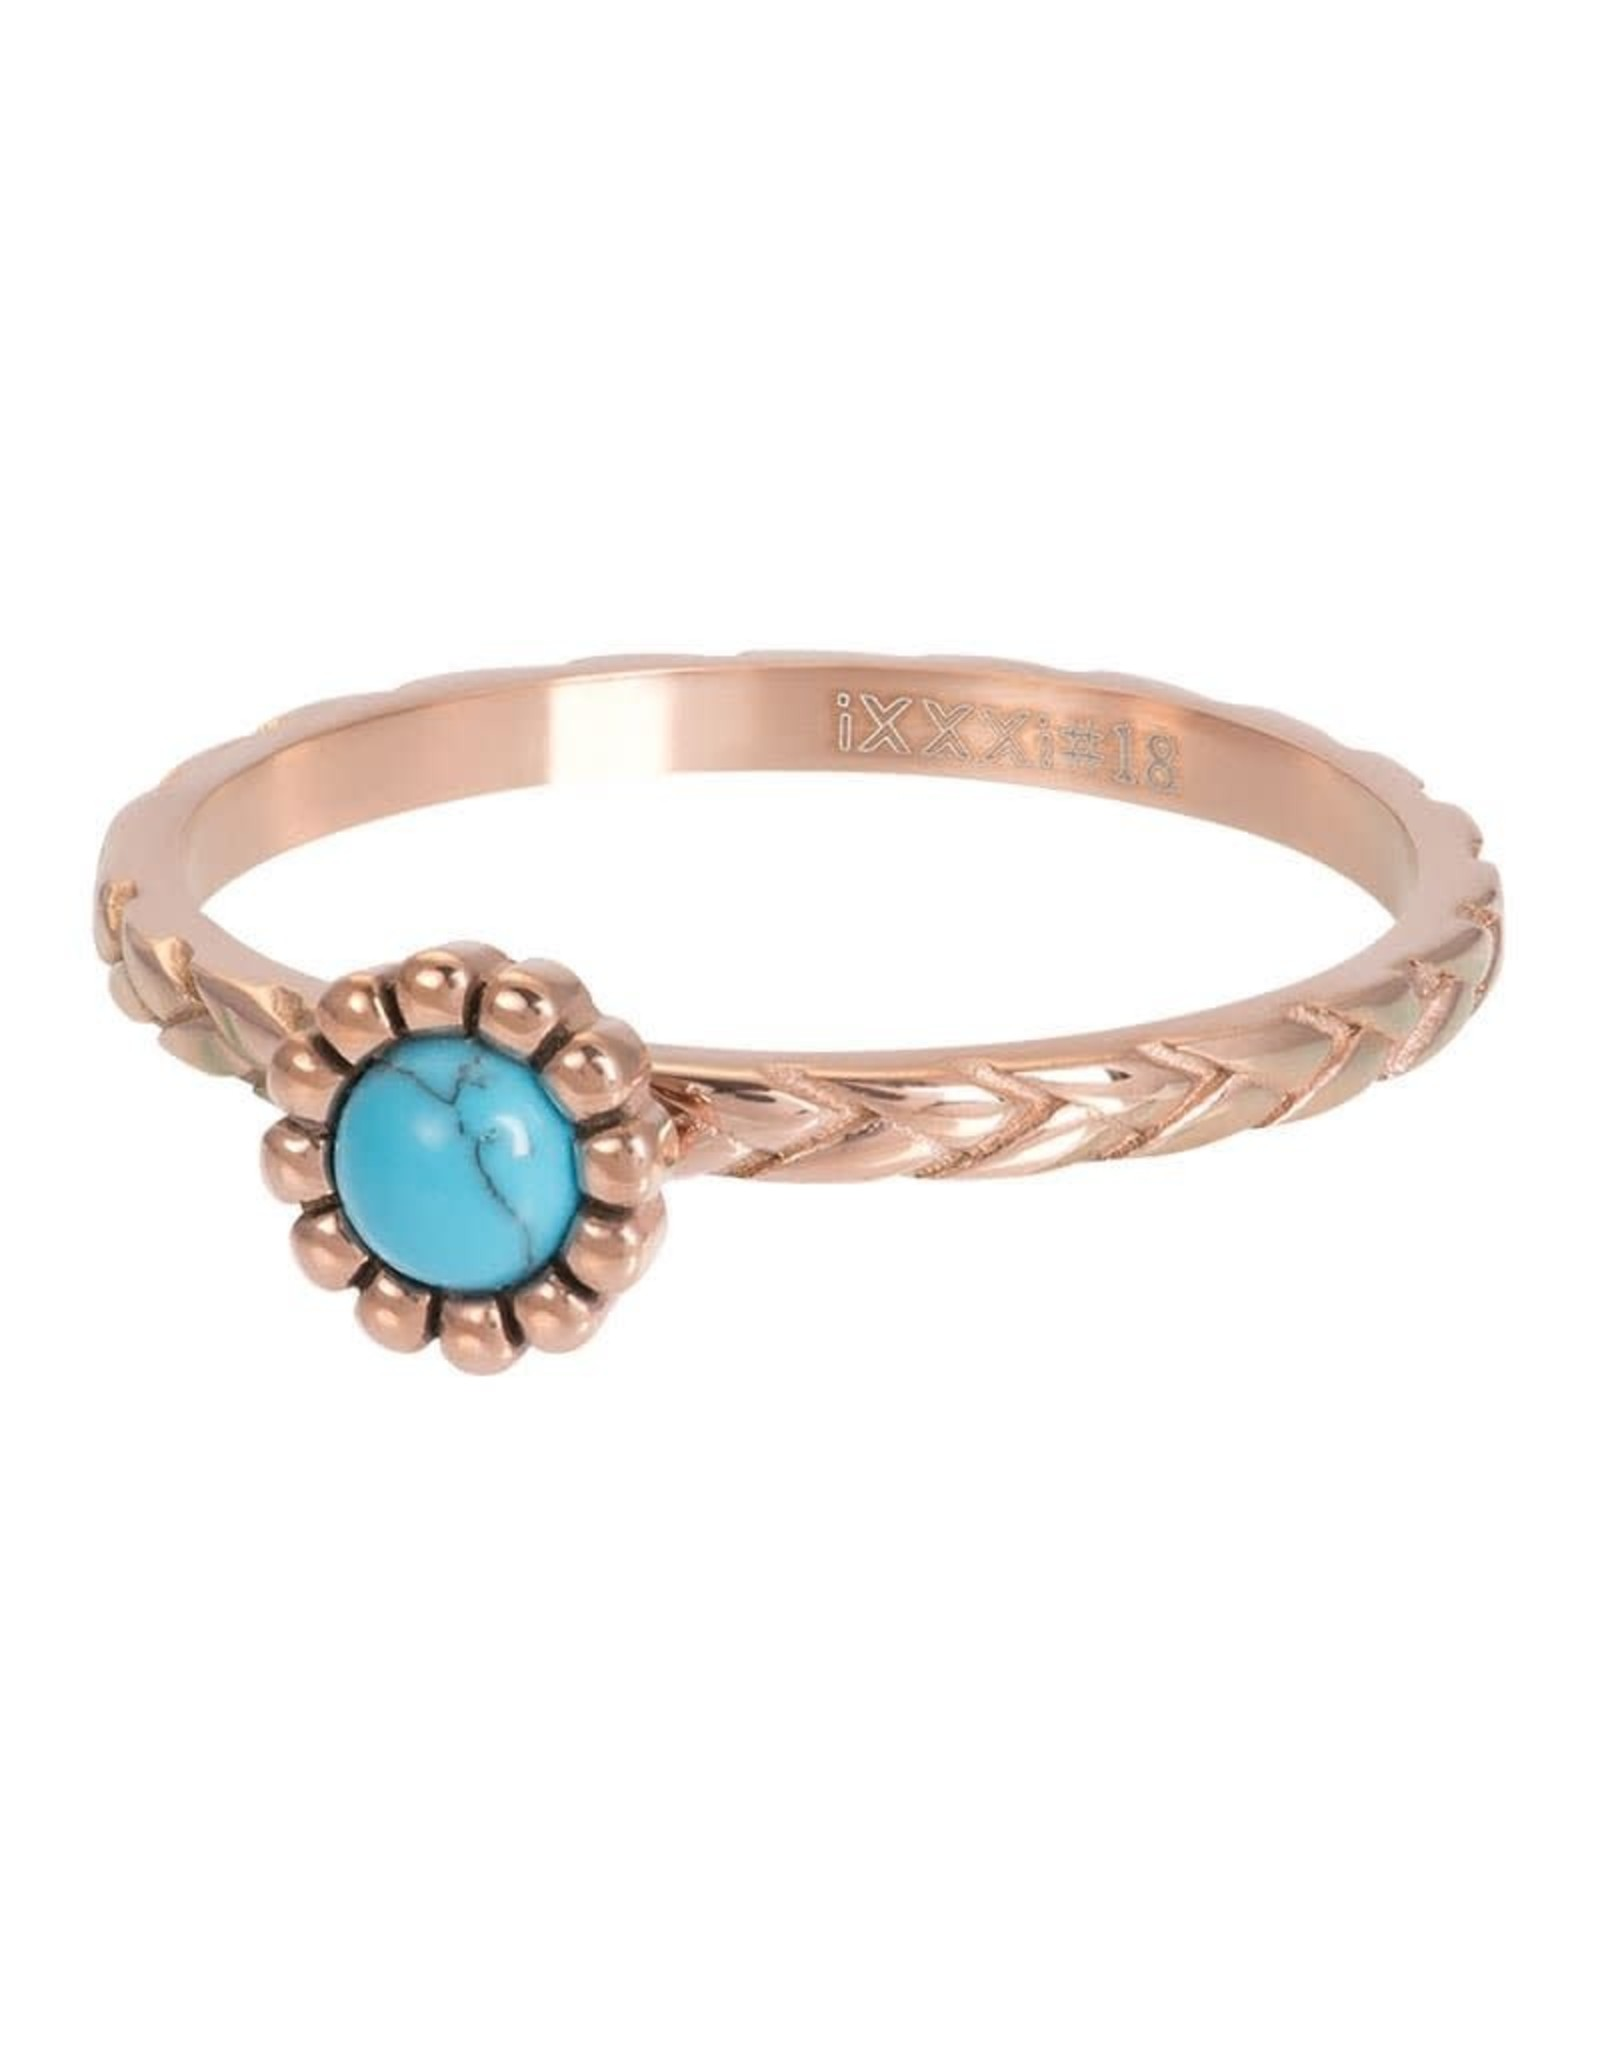 iXXXi Jewelry iXXXi vulring inspired turquoise - rose